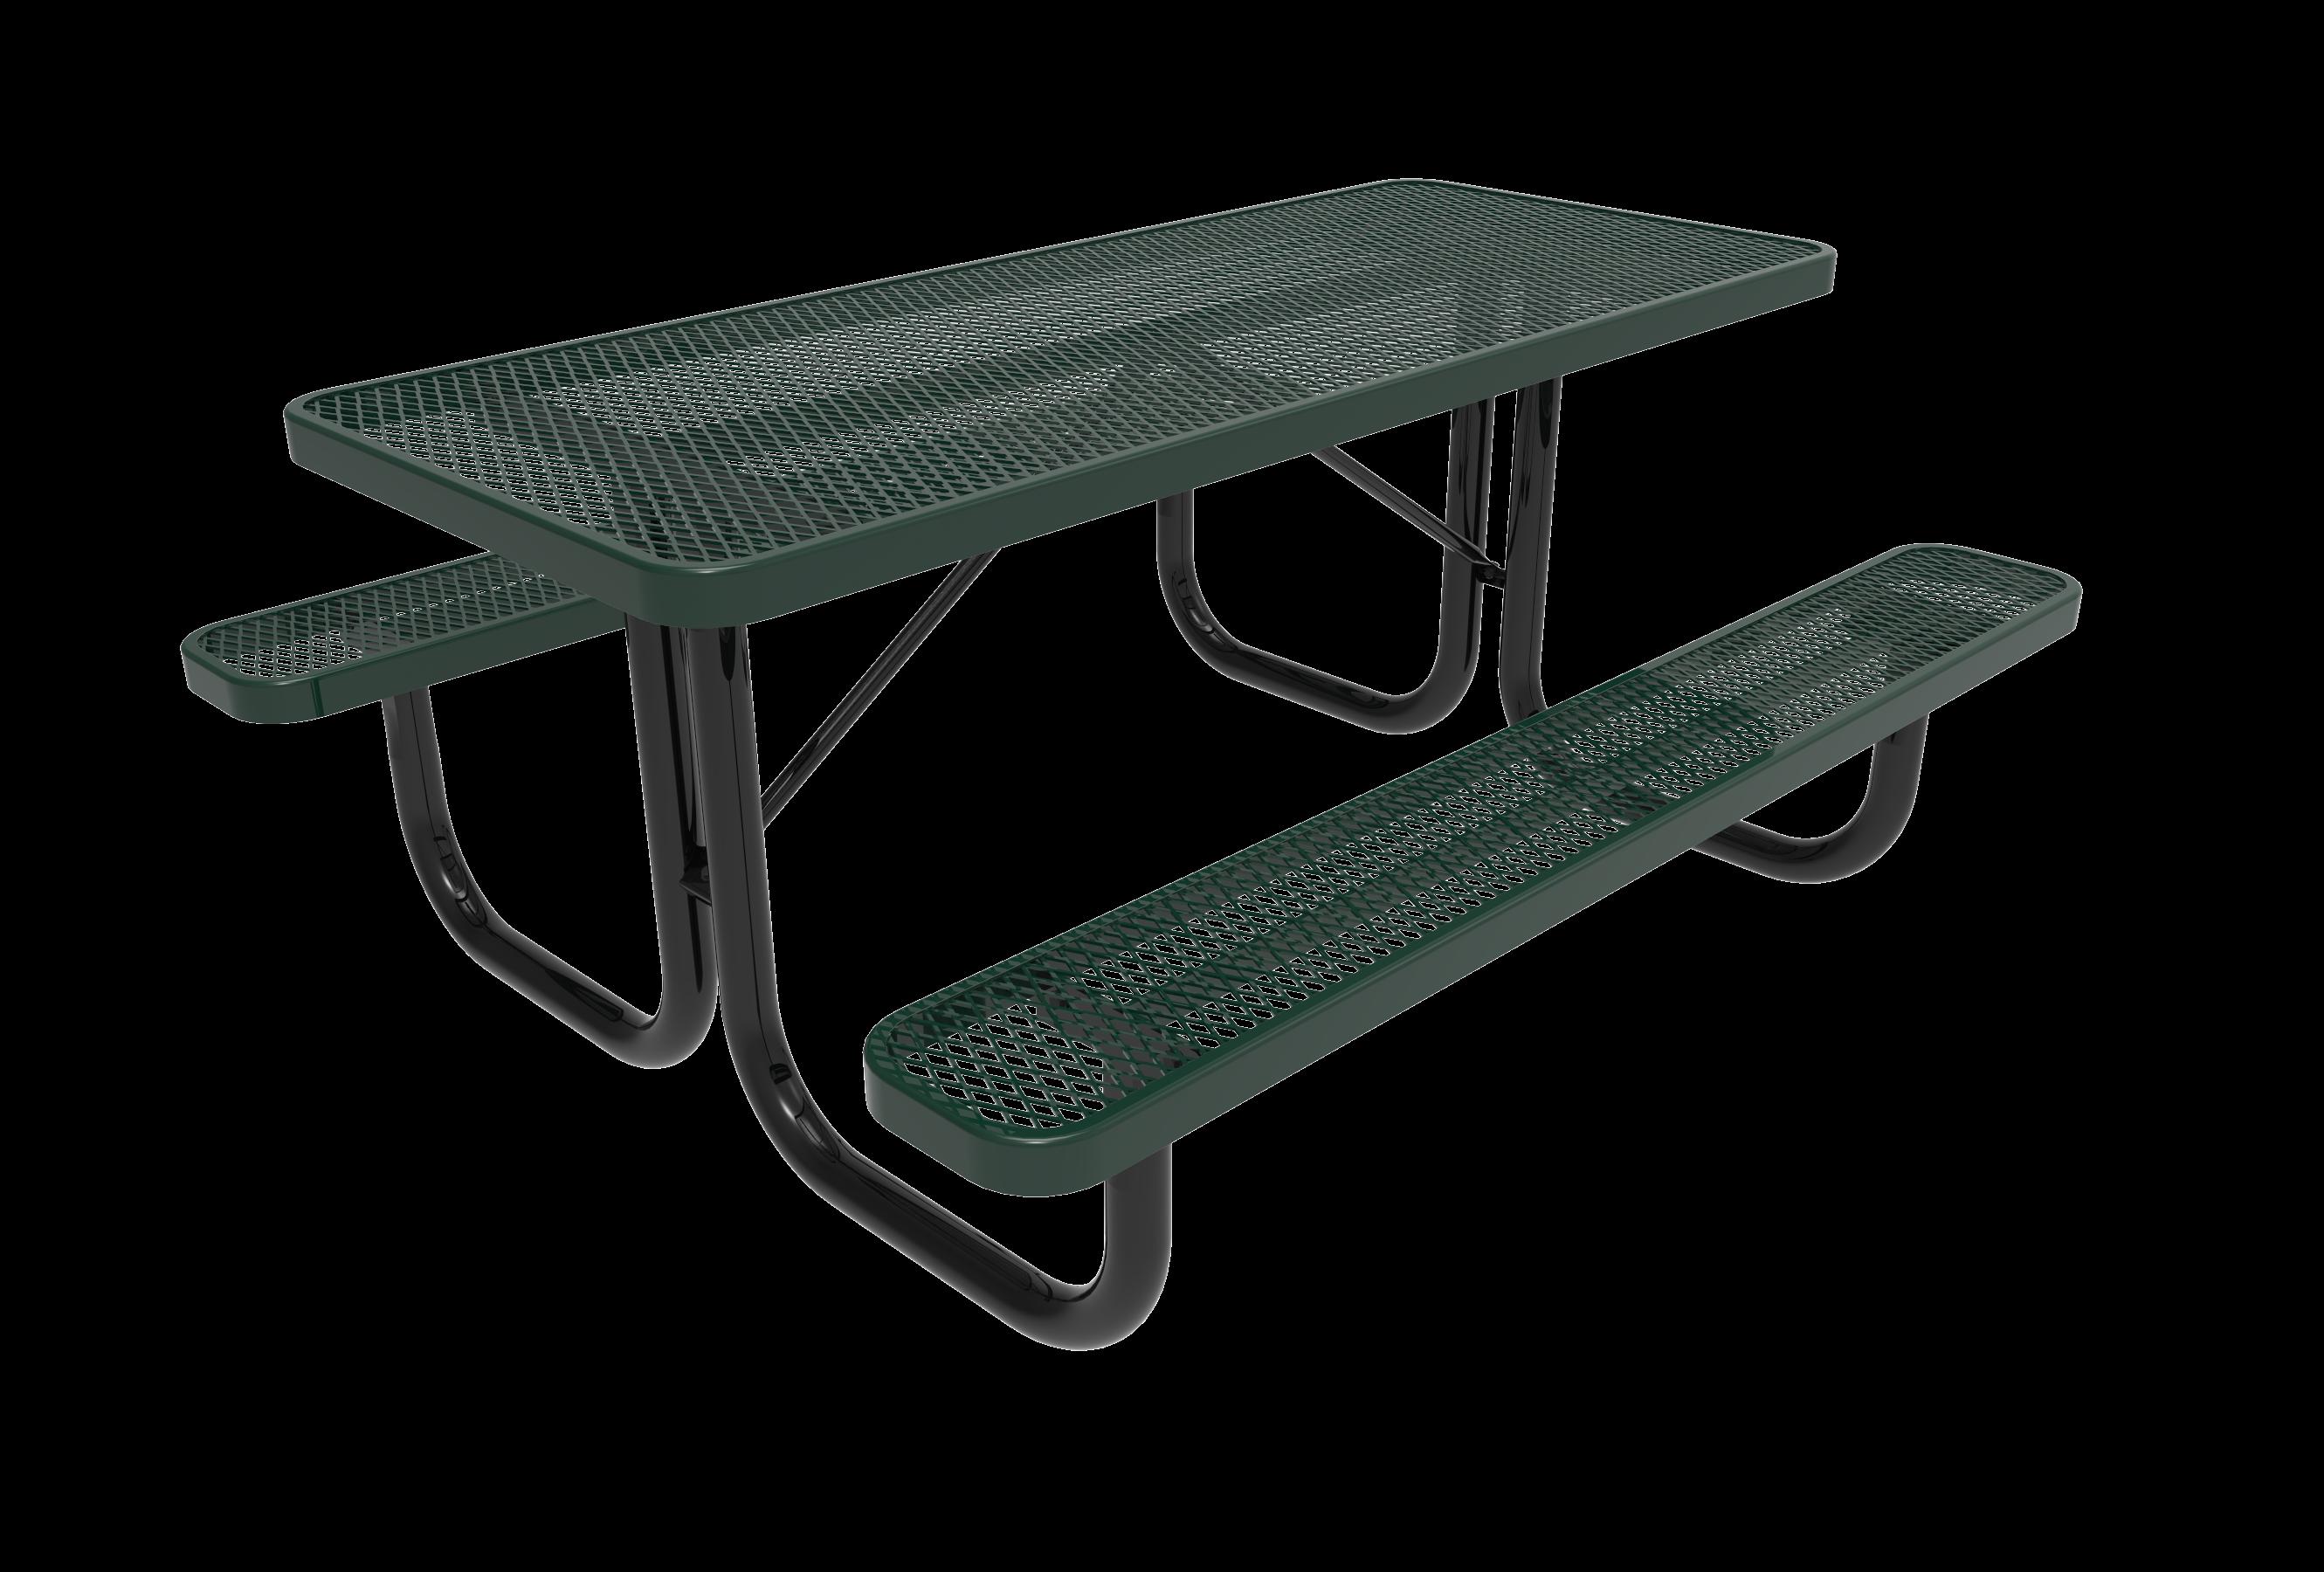 6-Ft. Heavy Duty Rectangular Picnic Table